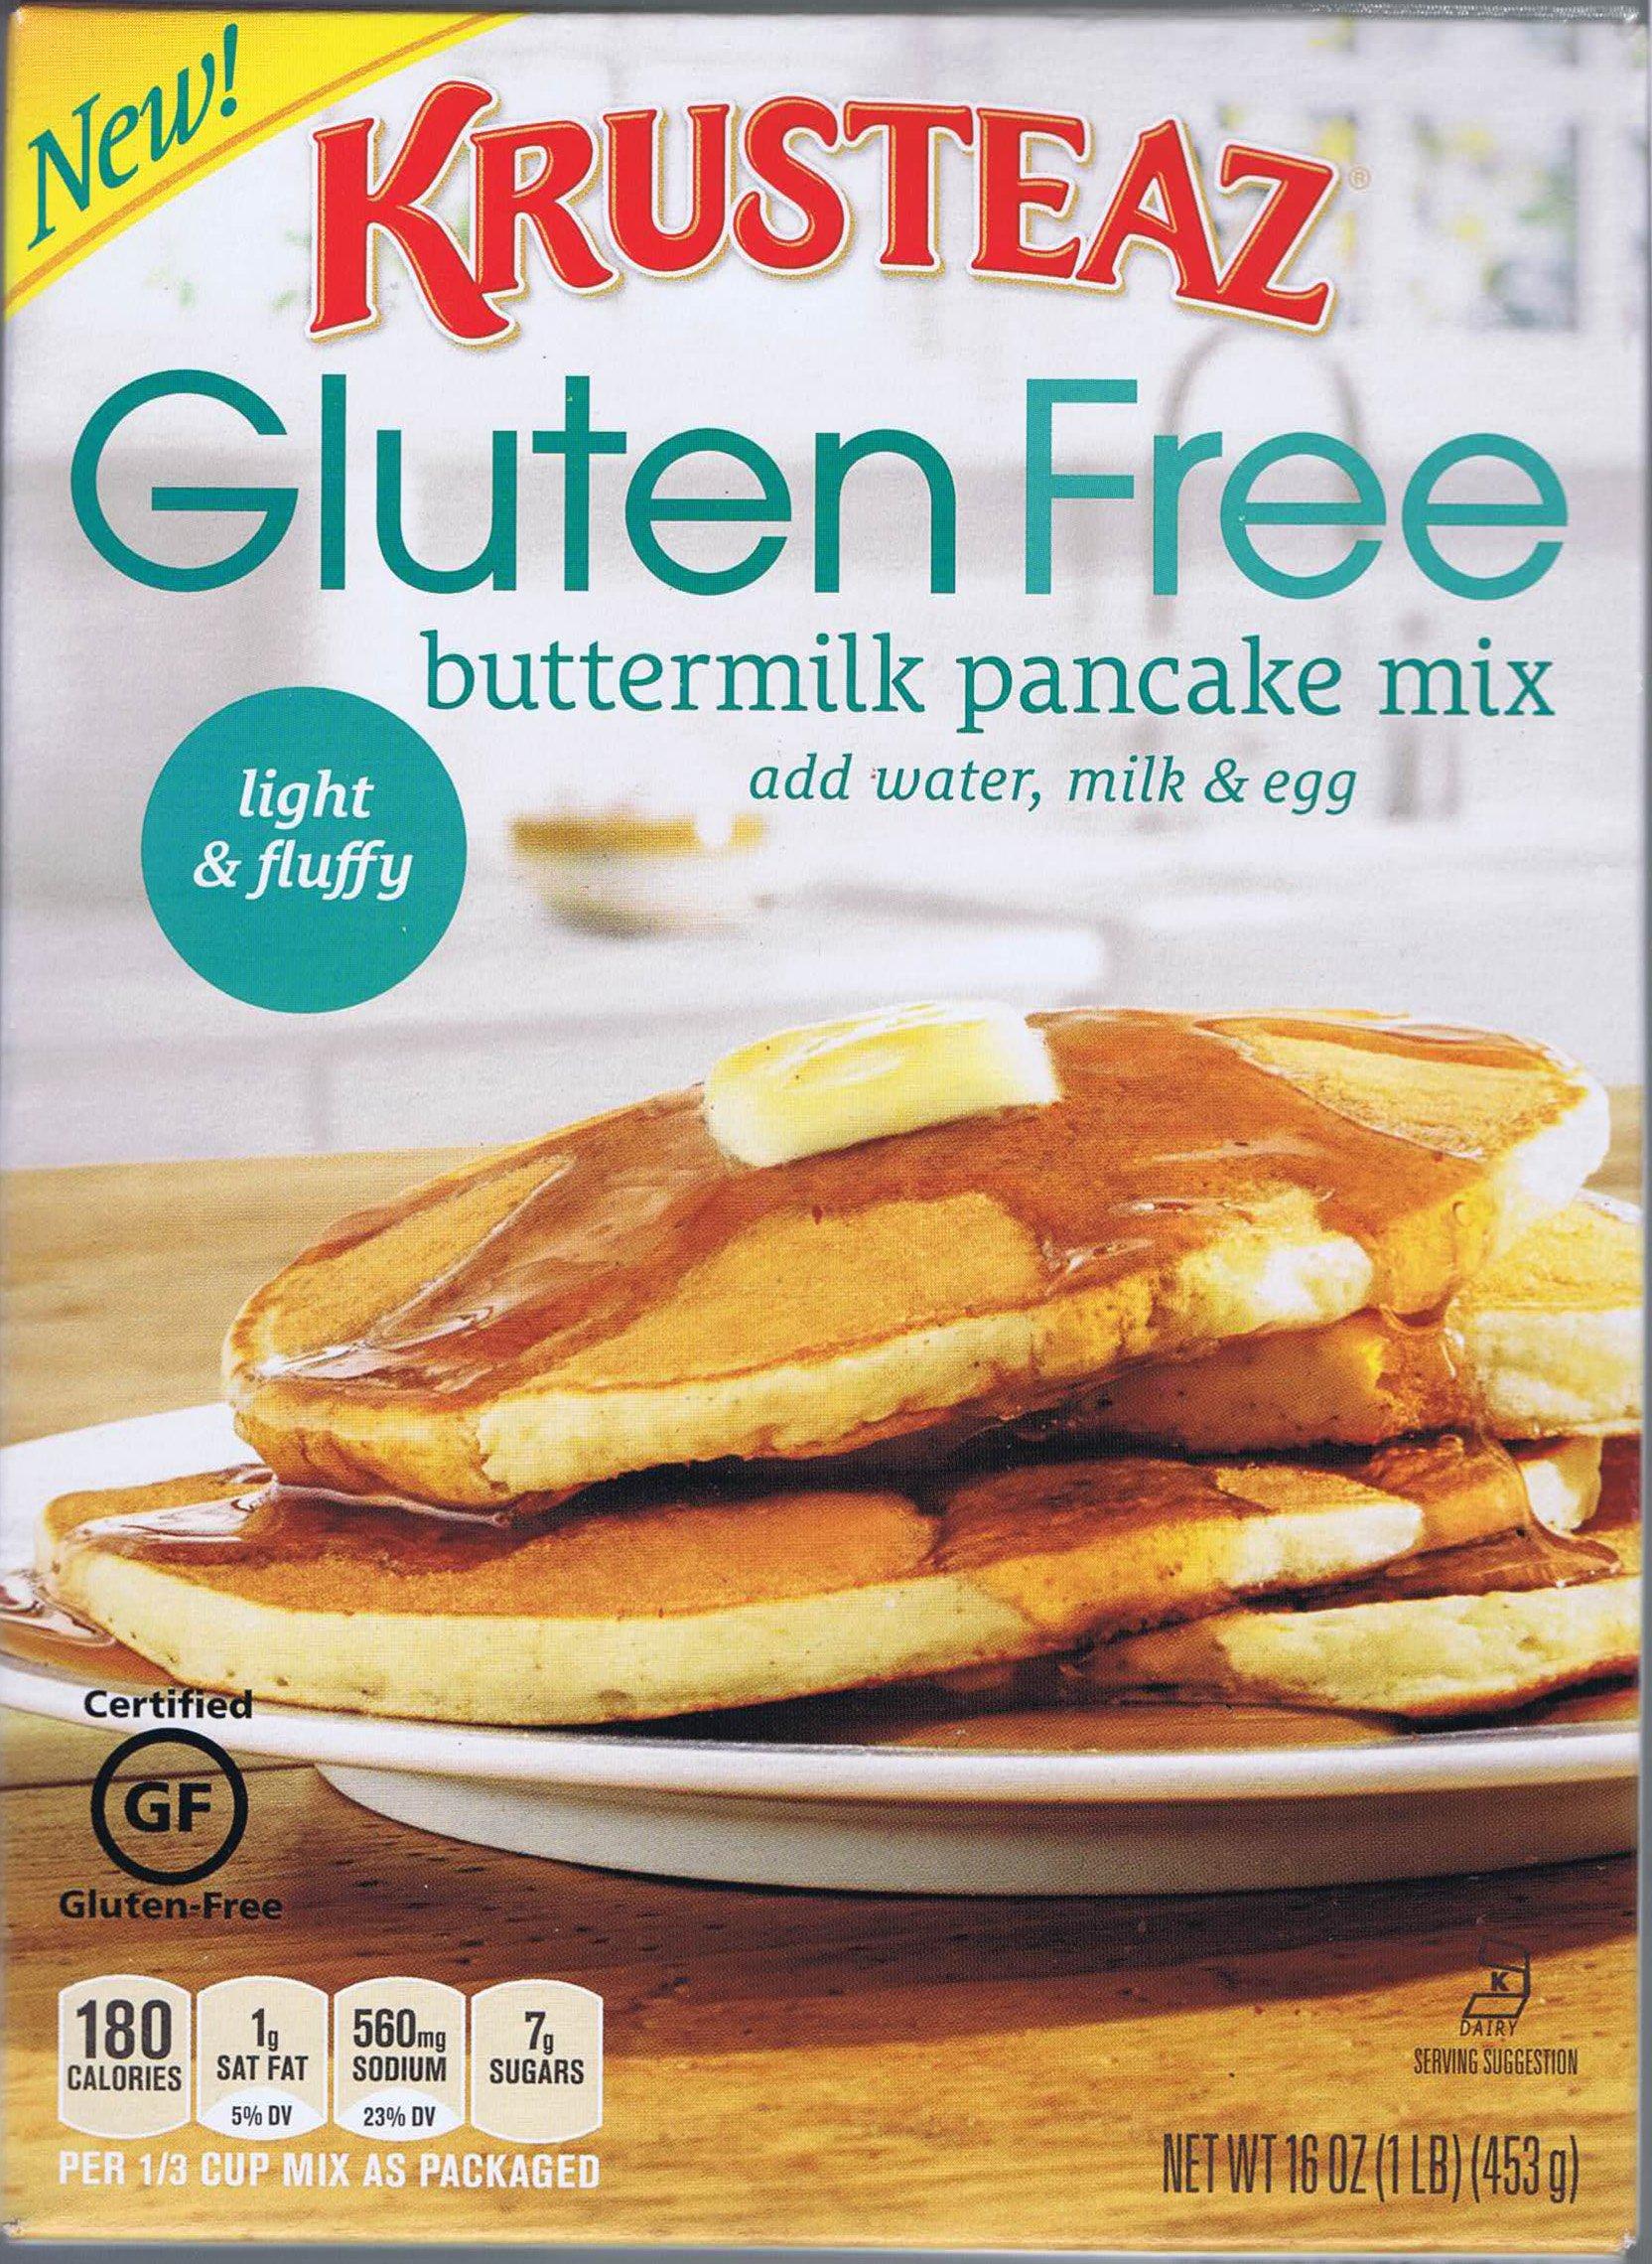 Krusteaz Gluten Free, Buttermilk Pancake Mix, Buttermilk, 16oz Box (Pack of 6) by Krusteaz